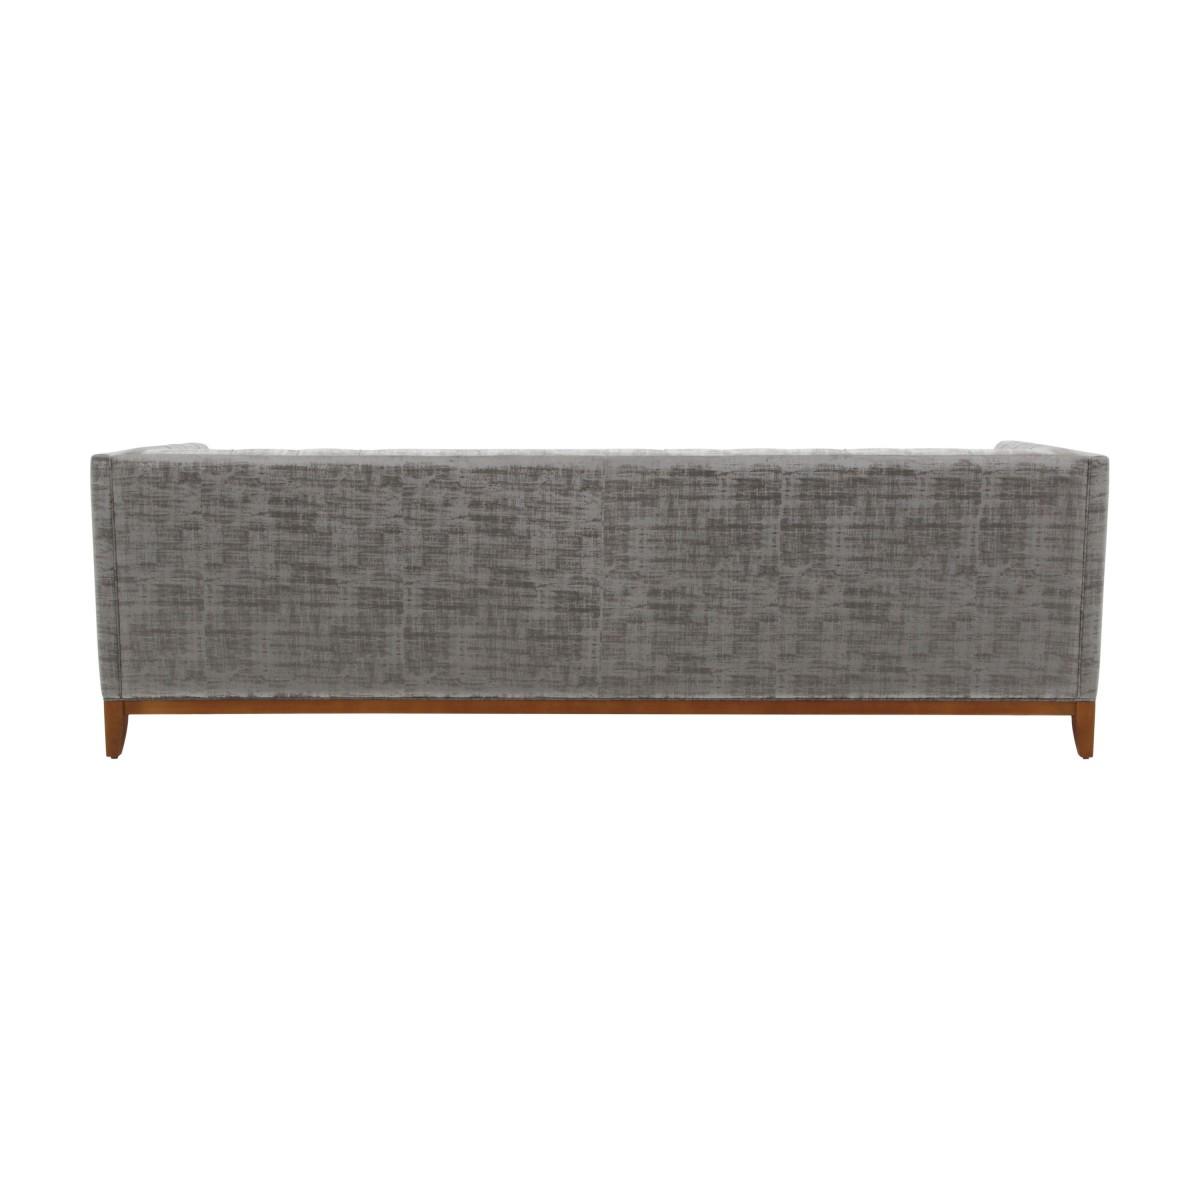 5 Seater sofa Lixis - Sevensedie